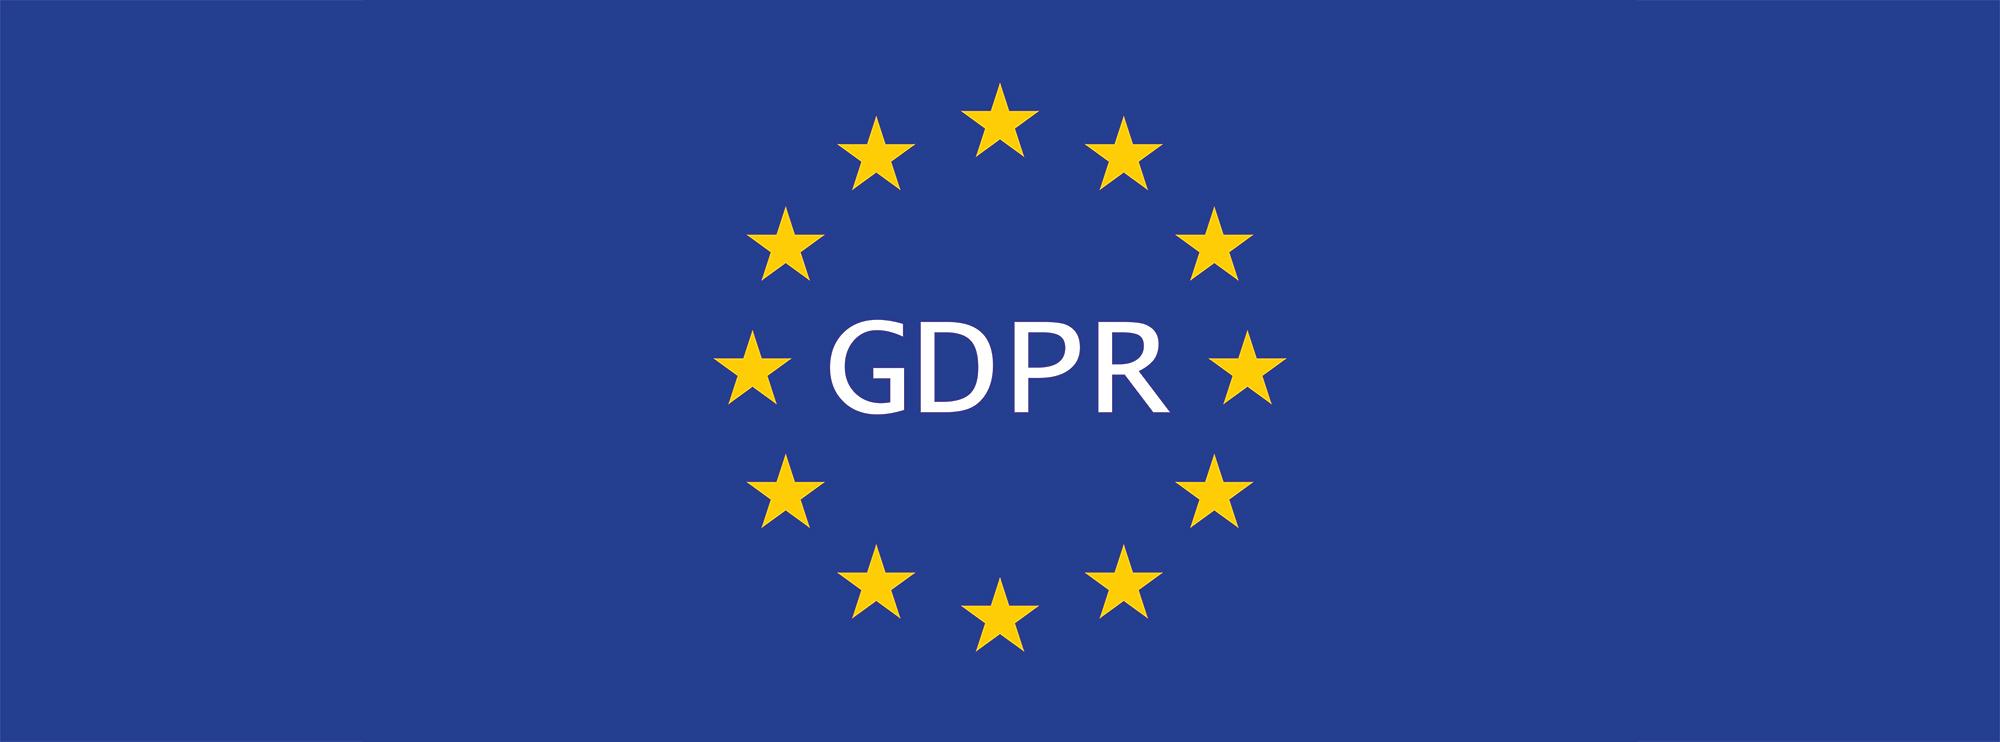 GDPR - Demand Gen Report Coverage